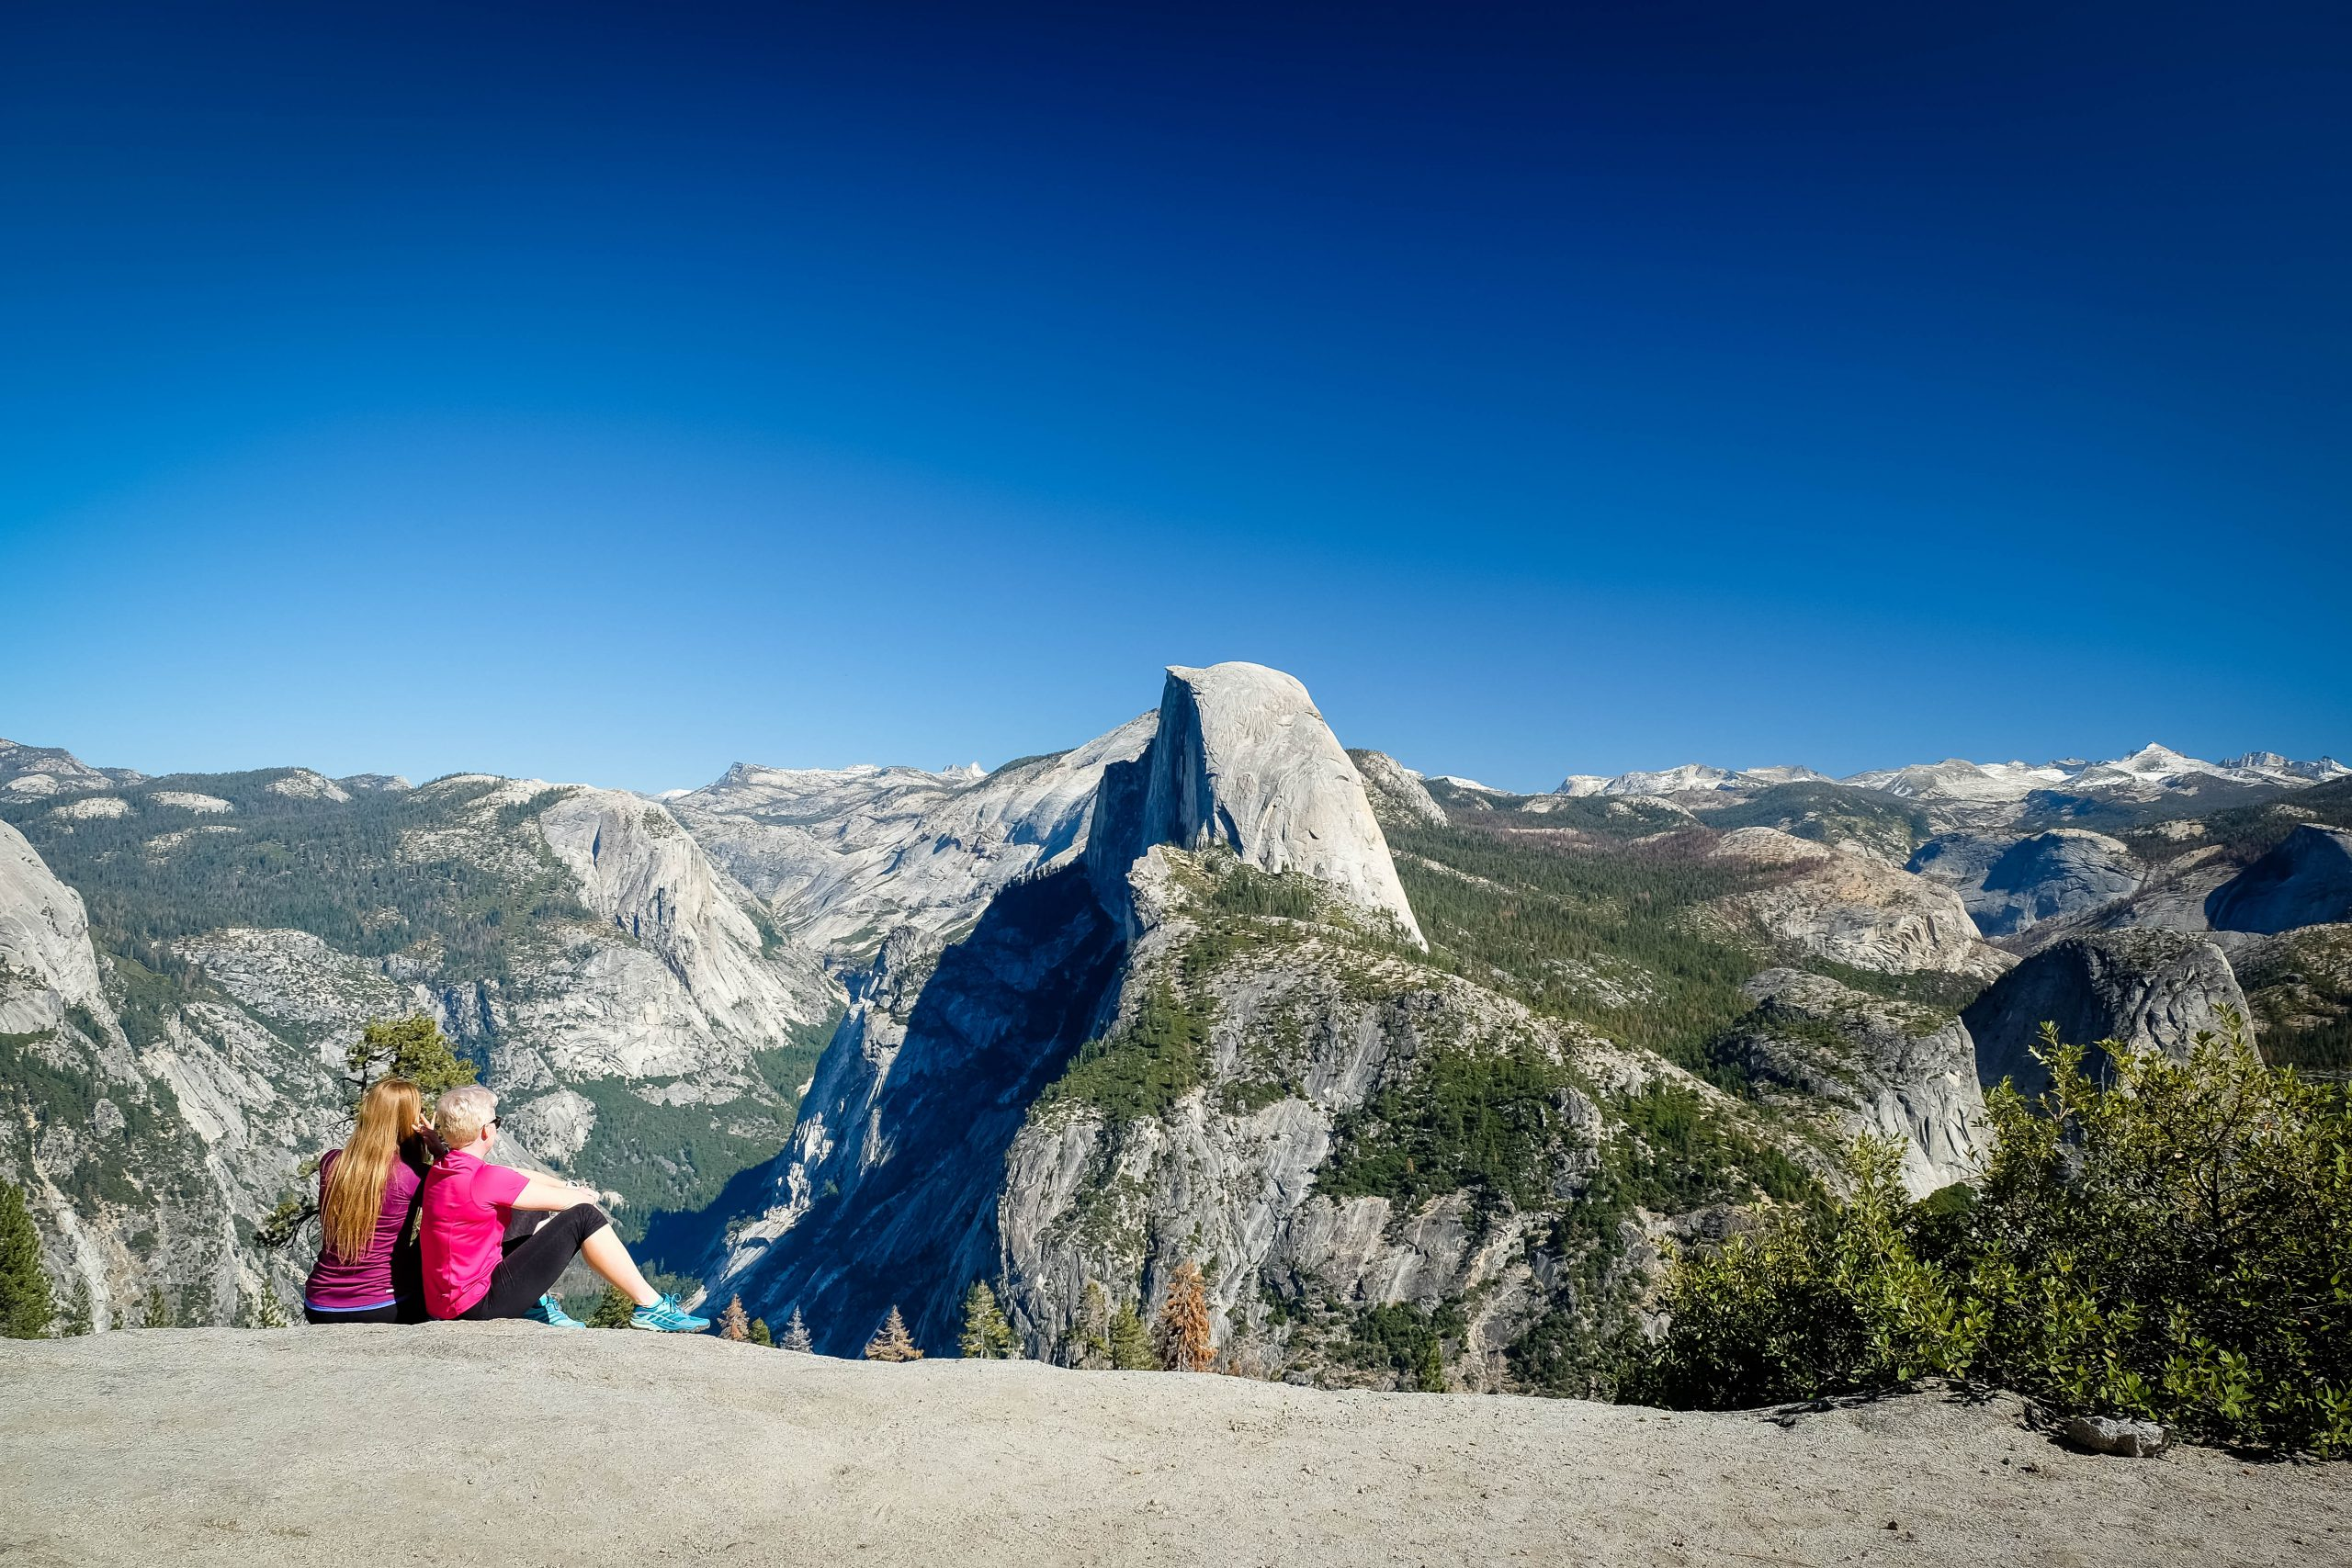 yosemite-national-park-half-dome-fiona-madden-photography